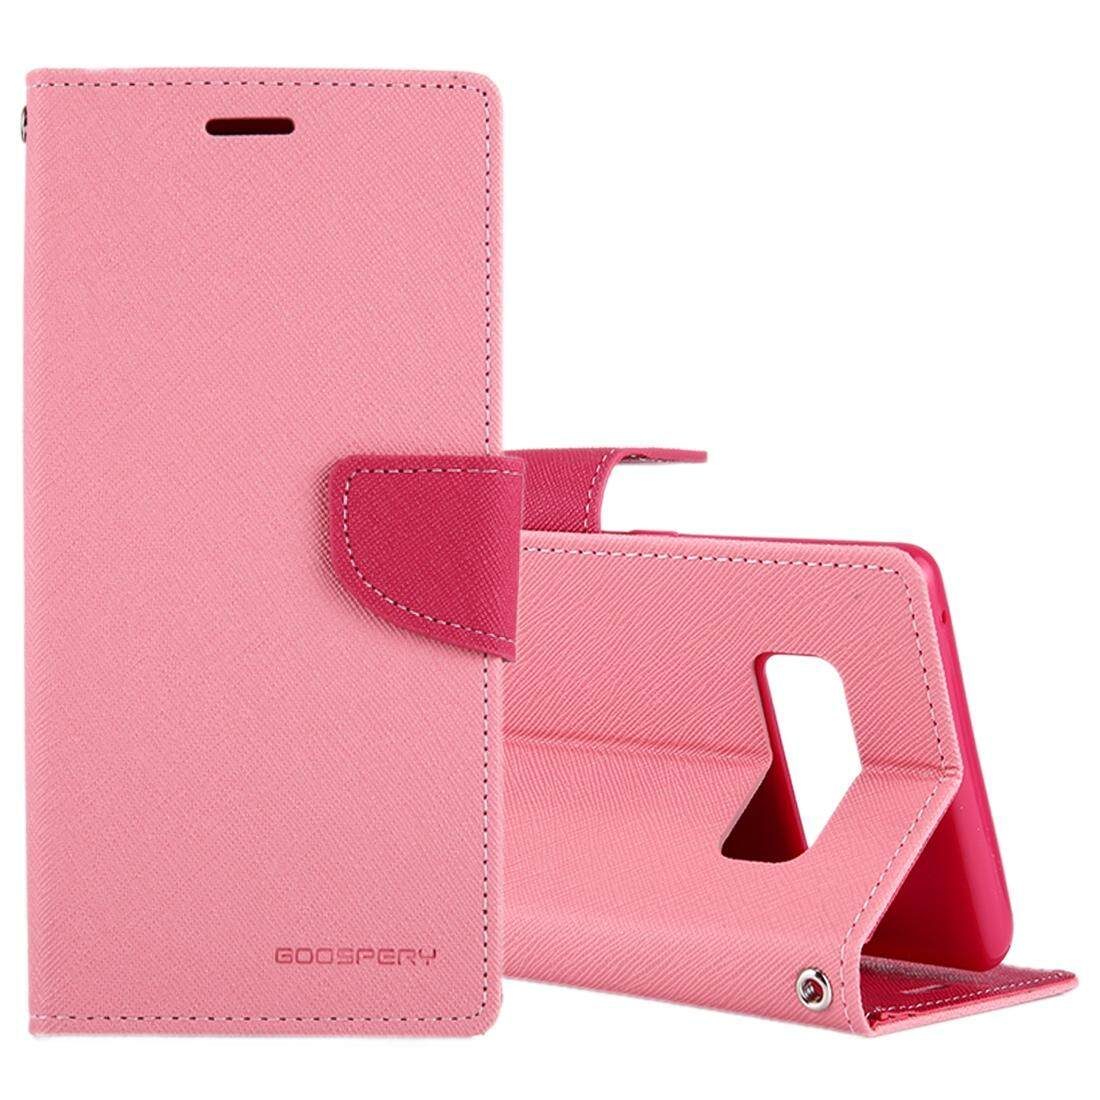 Harga Goospery Samsung Galaxy C9 Pro Blue Moon Flip Case Red Lolypoly Flipcase Leather Iphone 6 Cokelat Fitur Mercury Fancy Diary For Lenovo